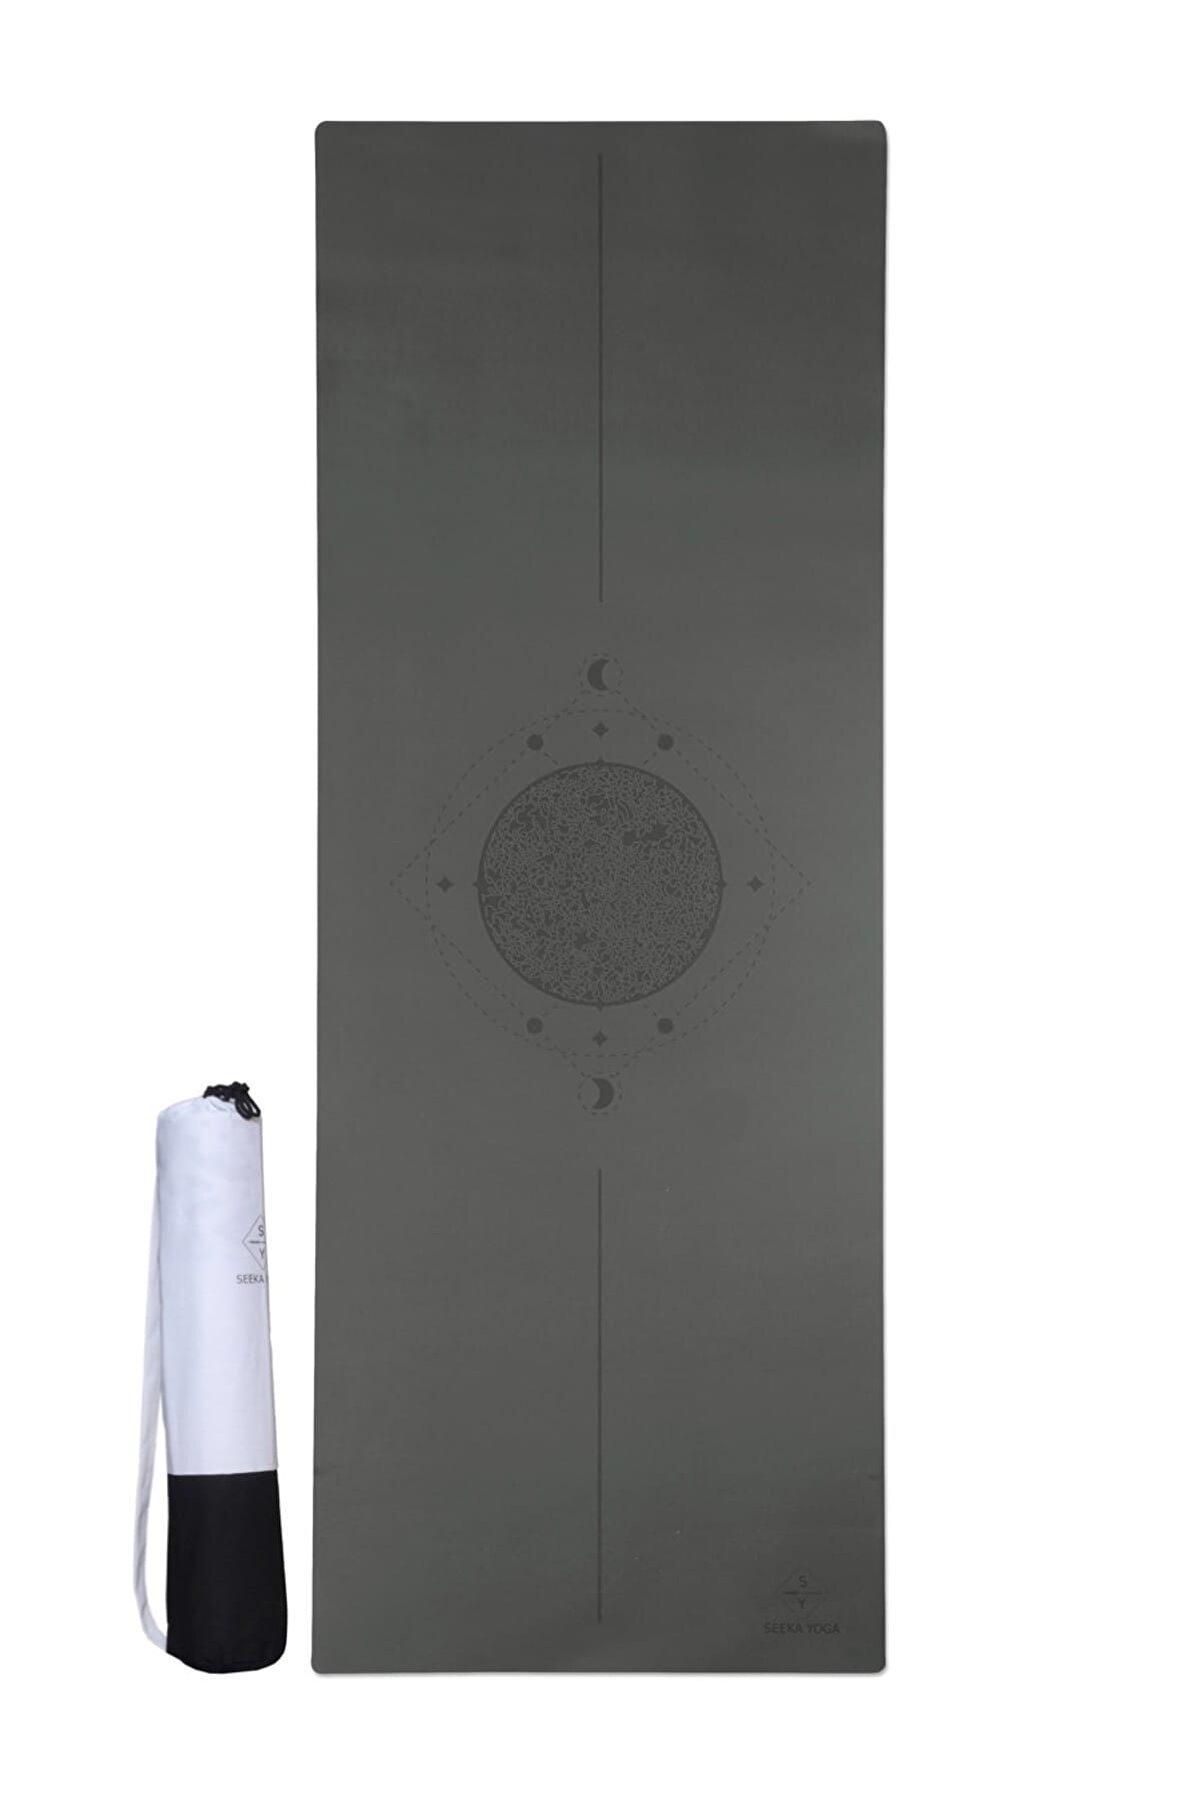 SEEKA Pro Serisi Yoga Matı Charcoal